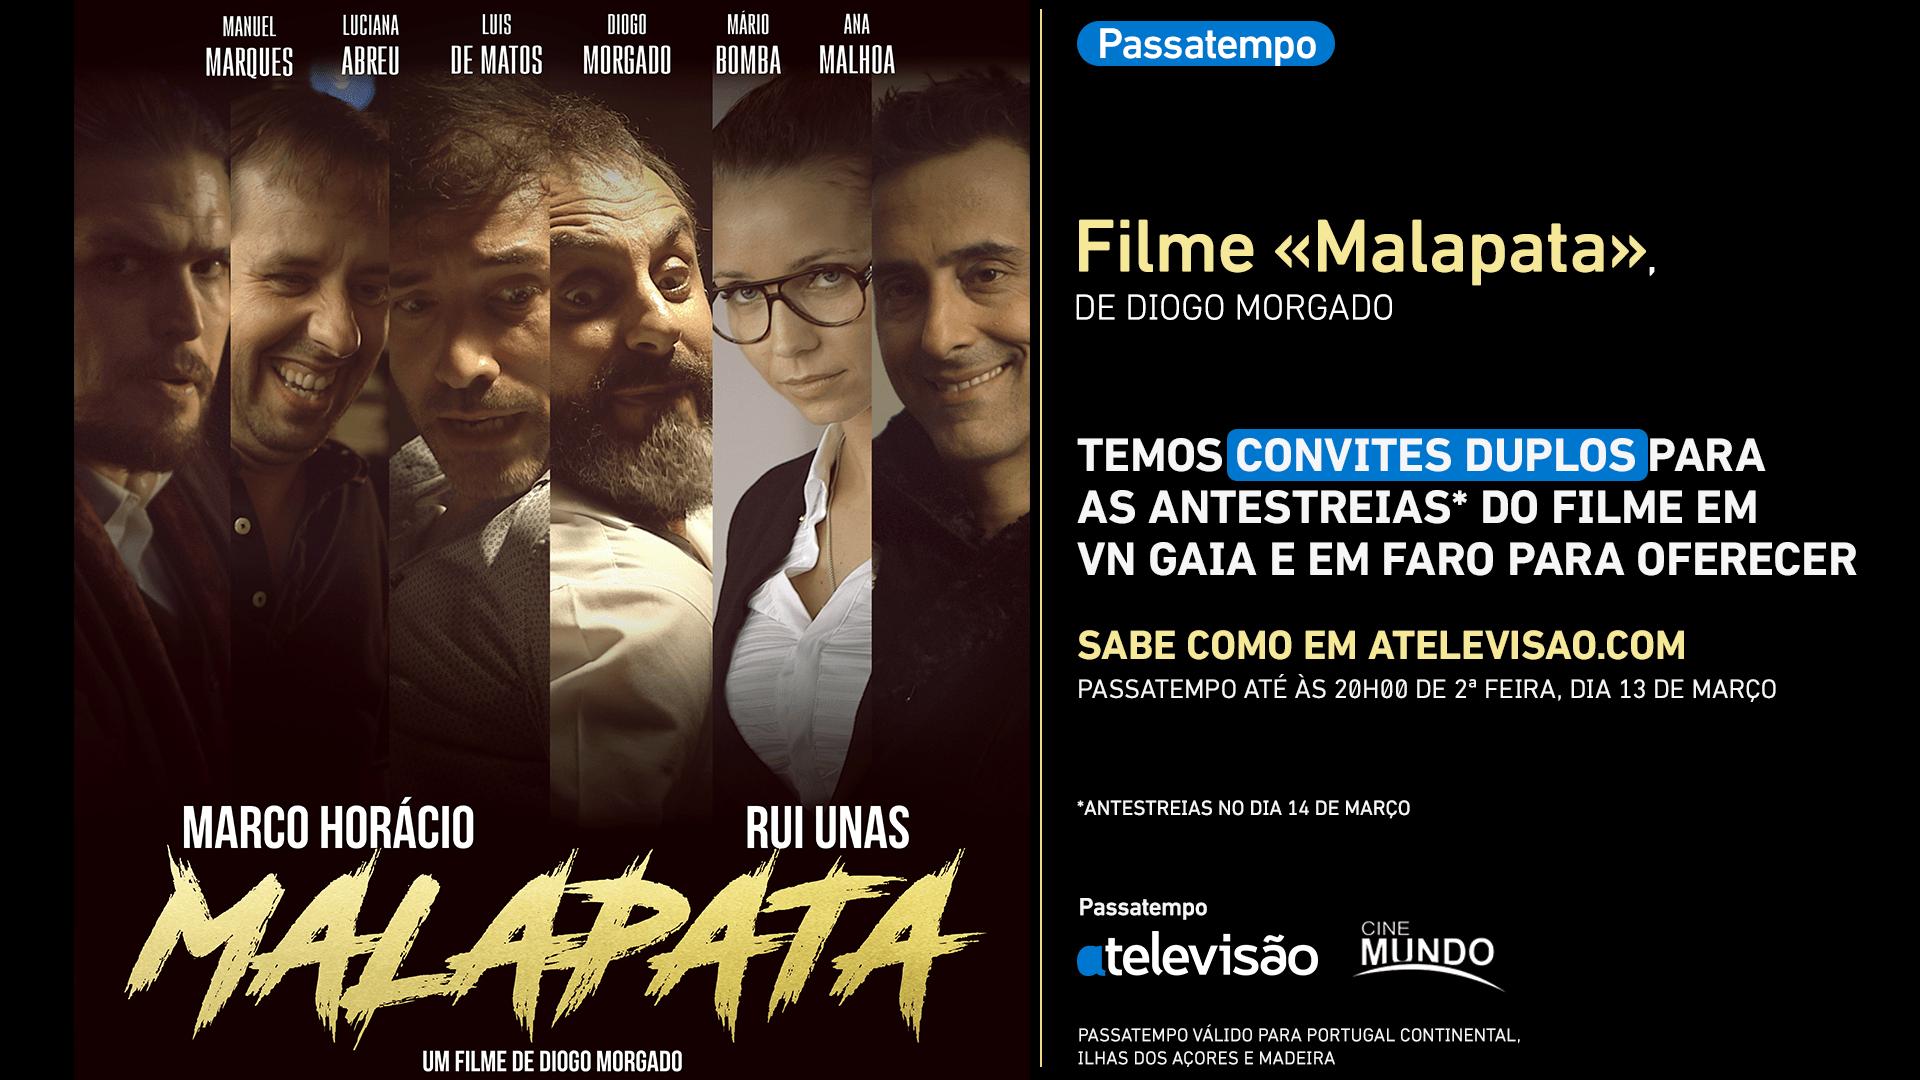 Malapata Passatempo Passatempo - Ganha Convites Duplos Para Anteestreias De «Malapata»